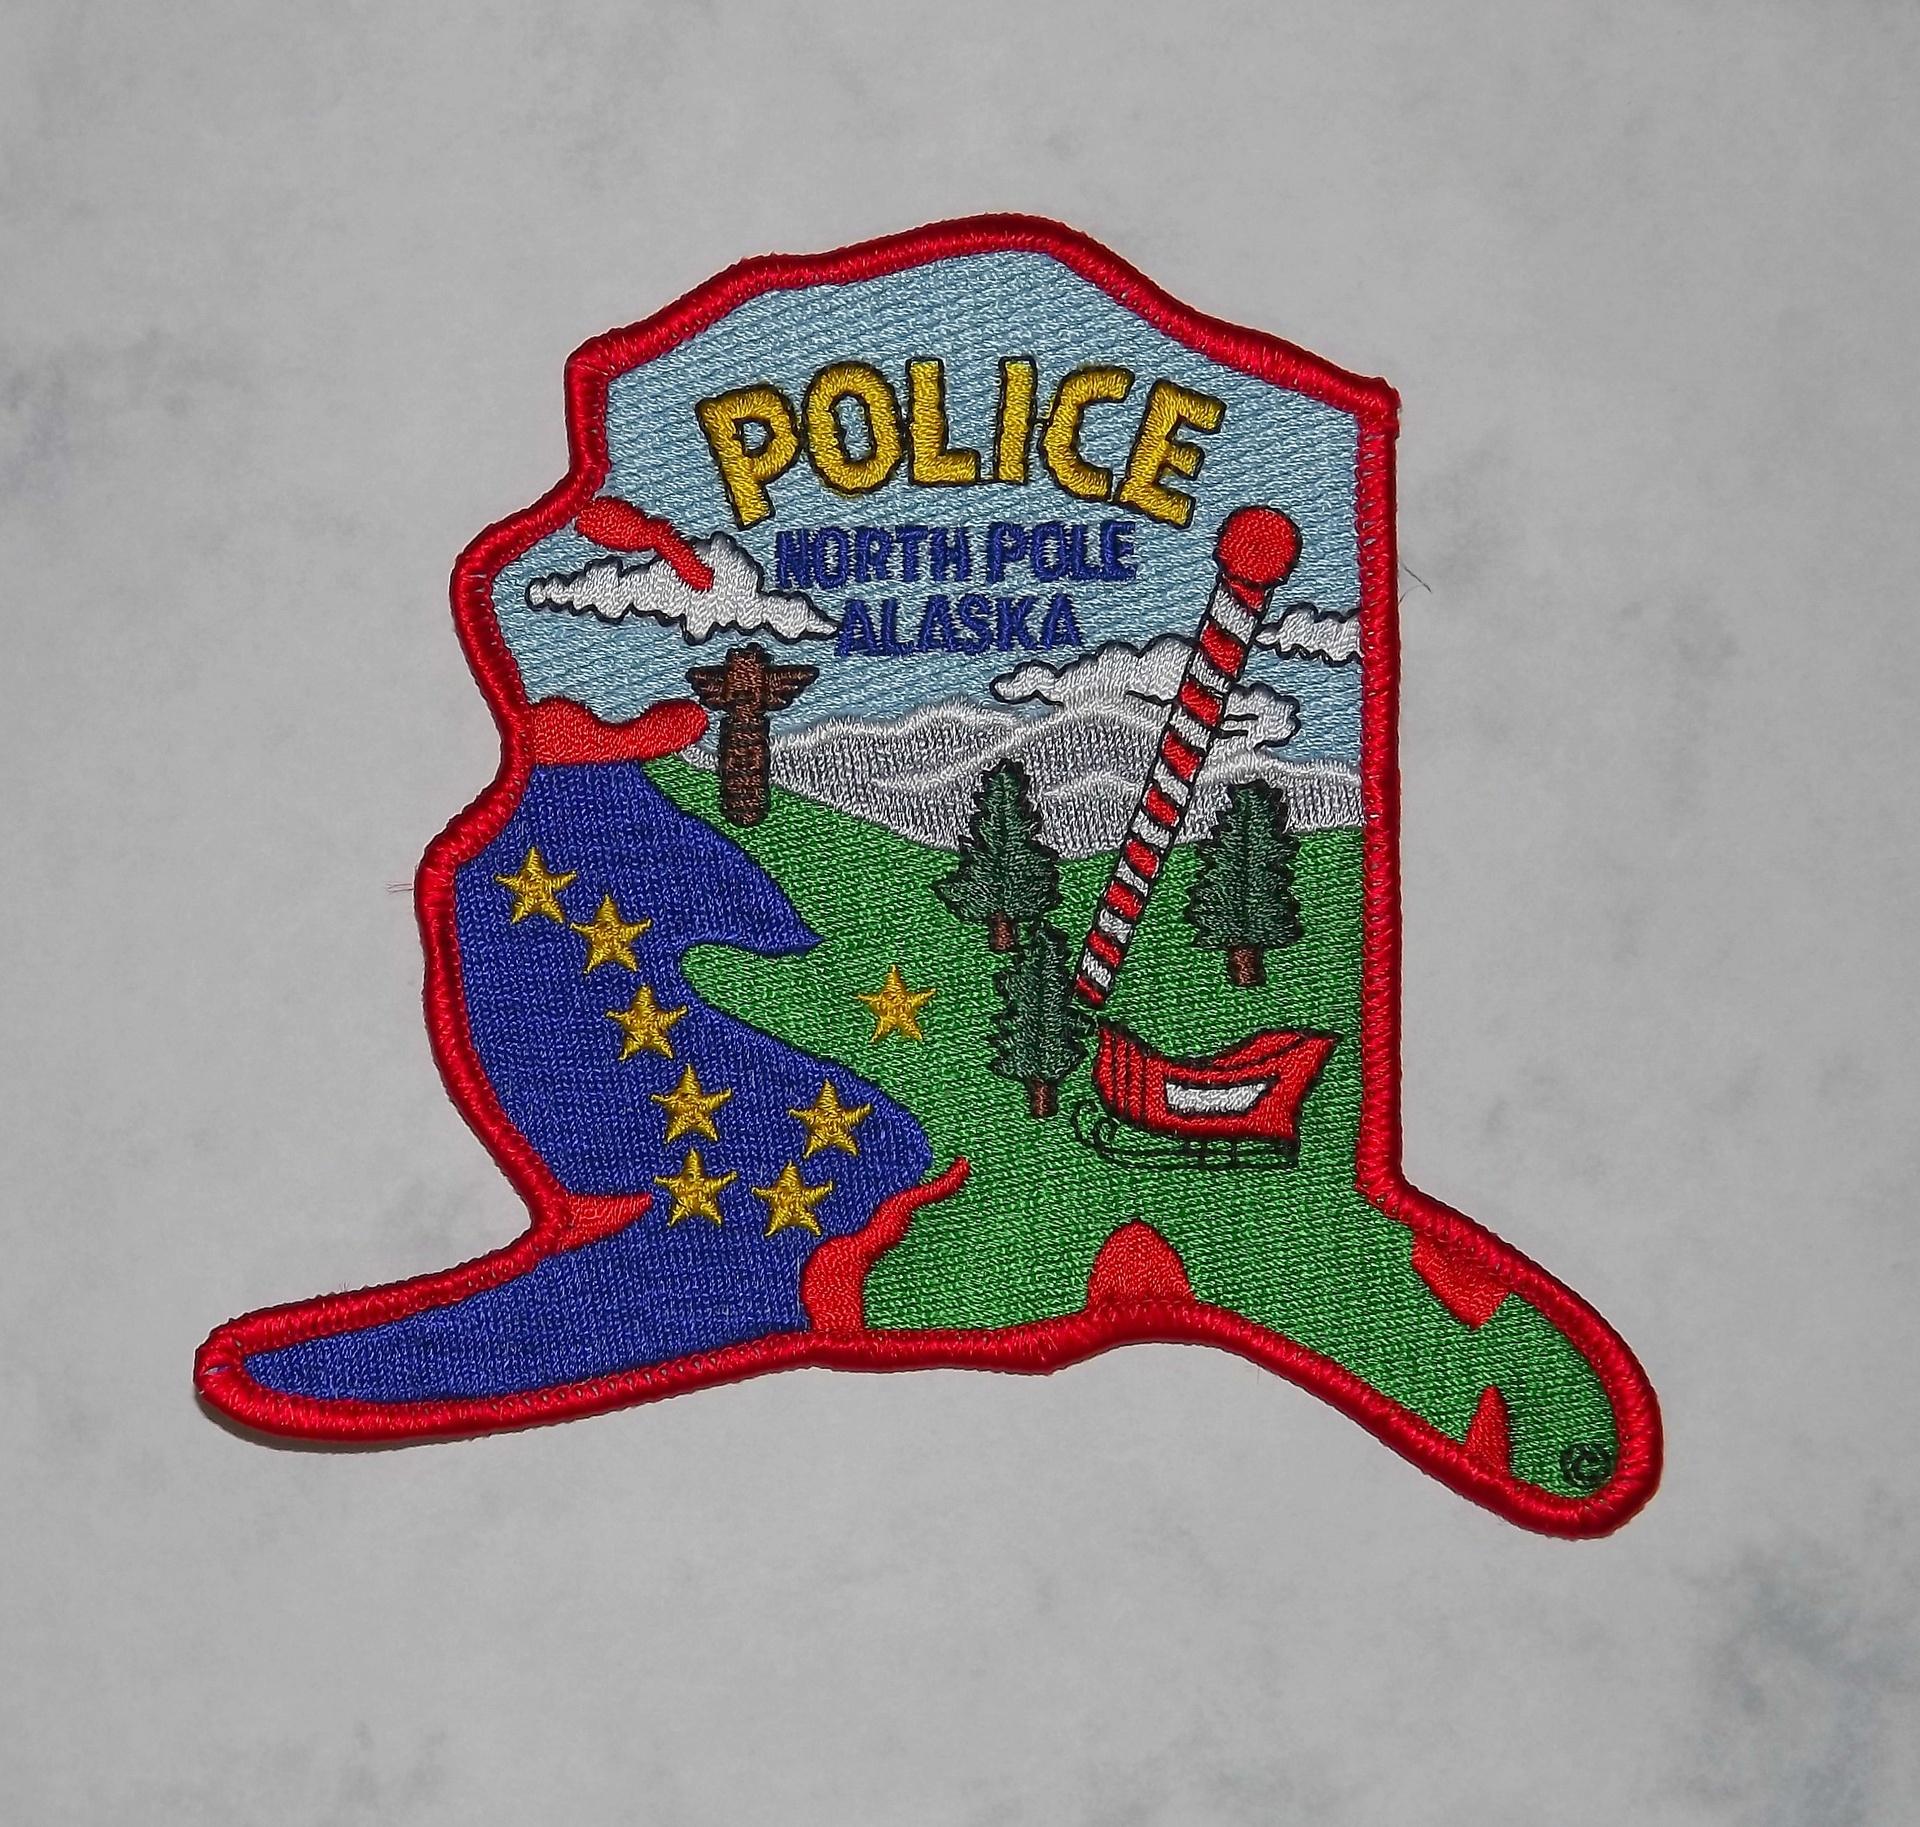 North Pole Alaska Police